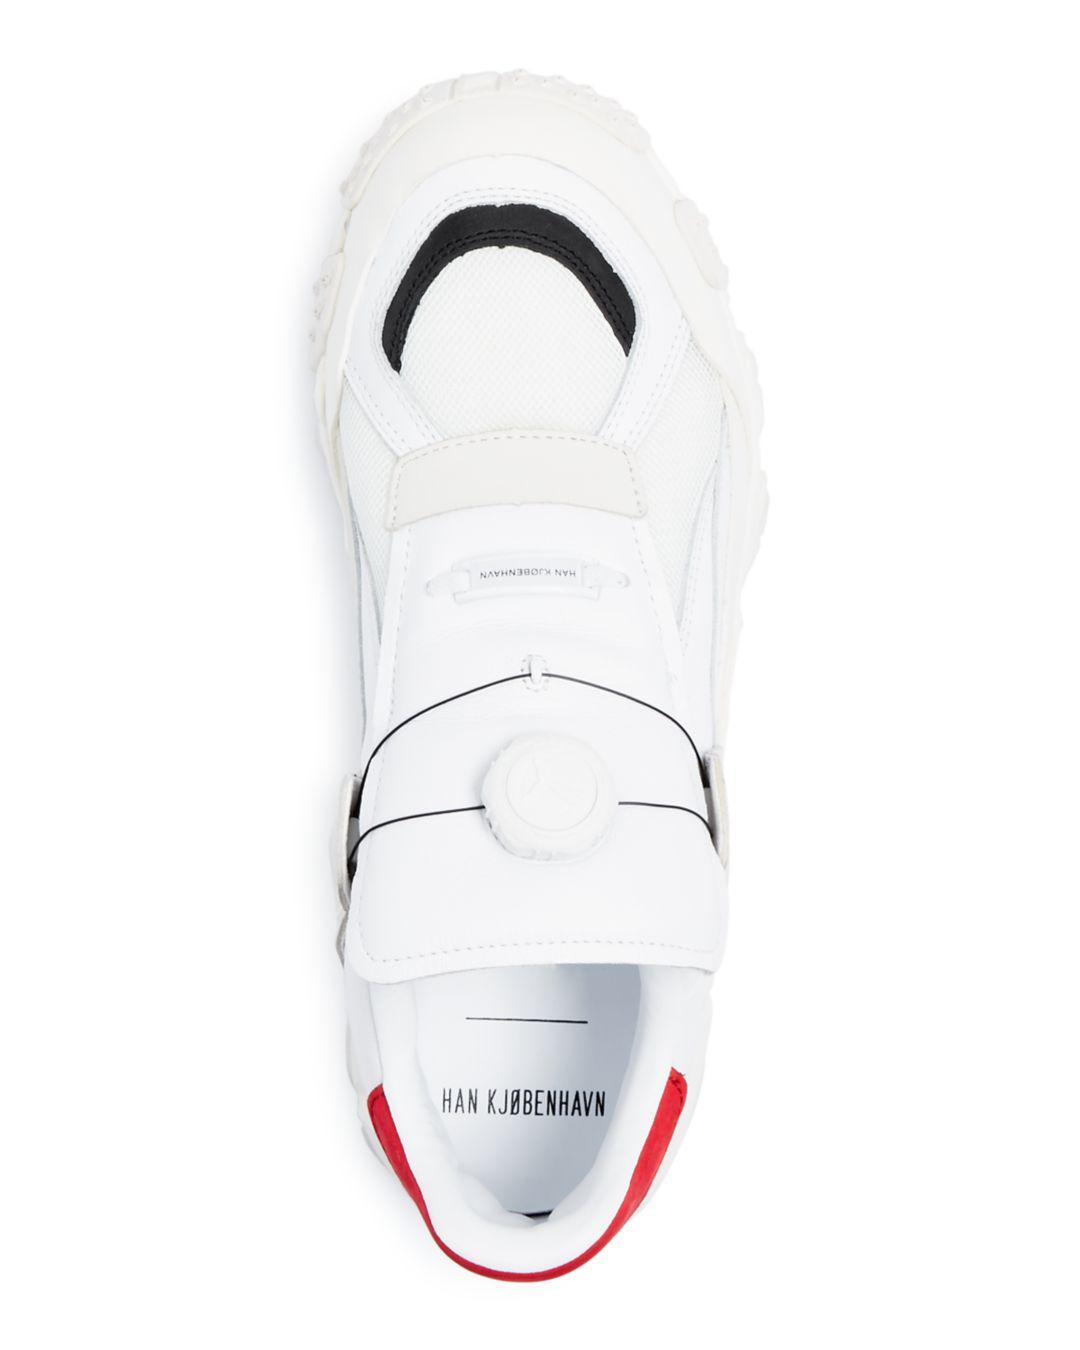 Lyst - PUMA X Han Kjobenhavn Men s Trailhaven Color-block Leather Sneakers  in White for Men b1c314acd